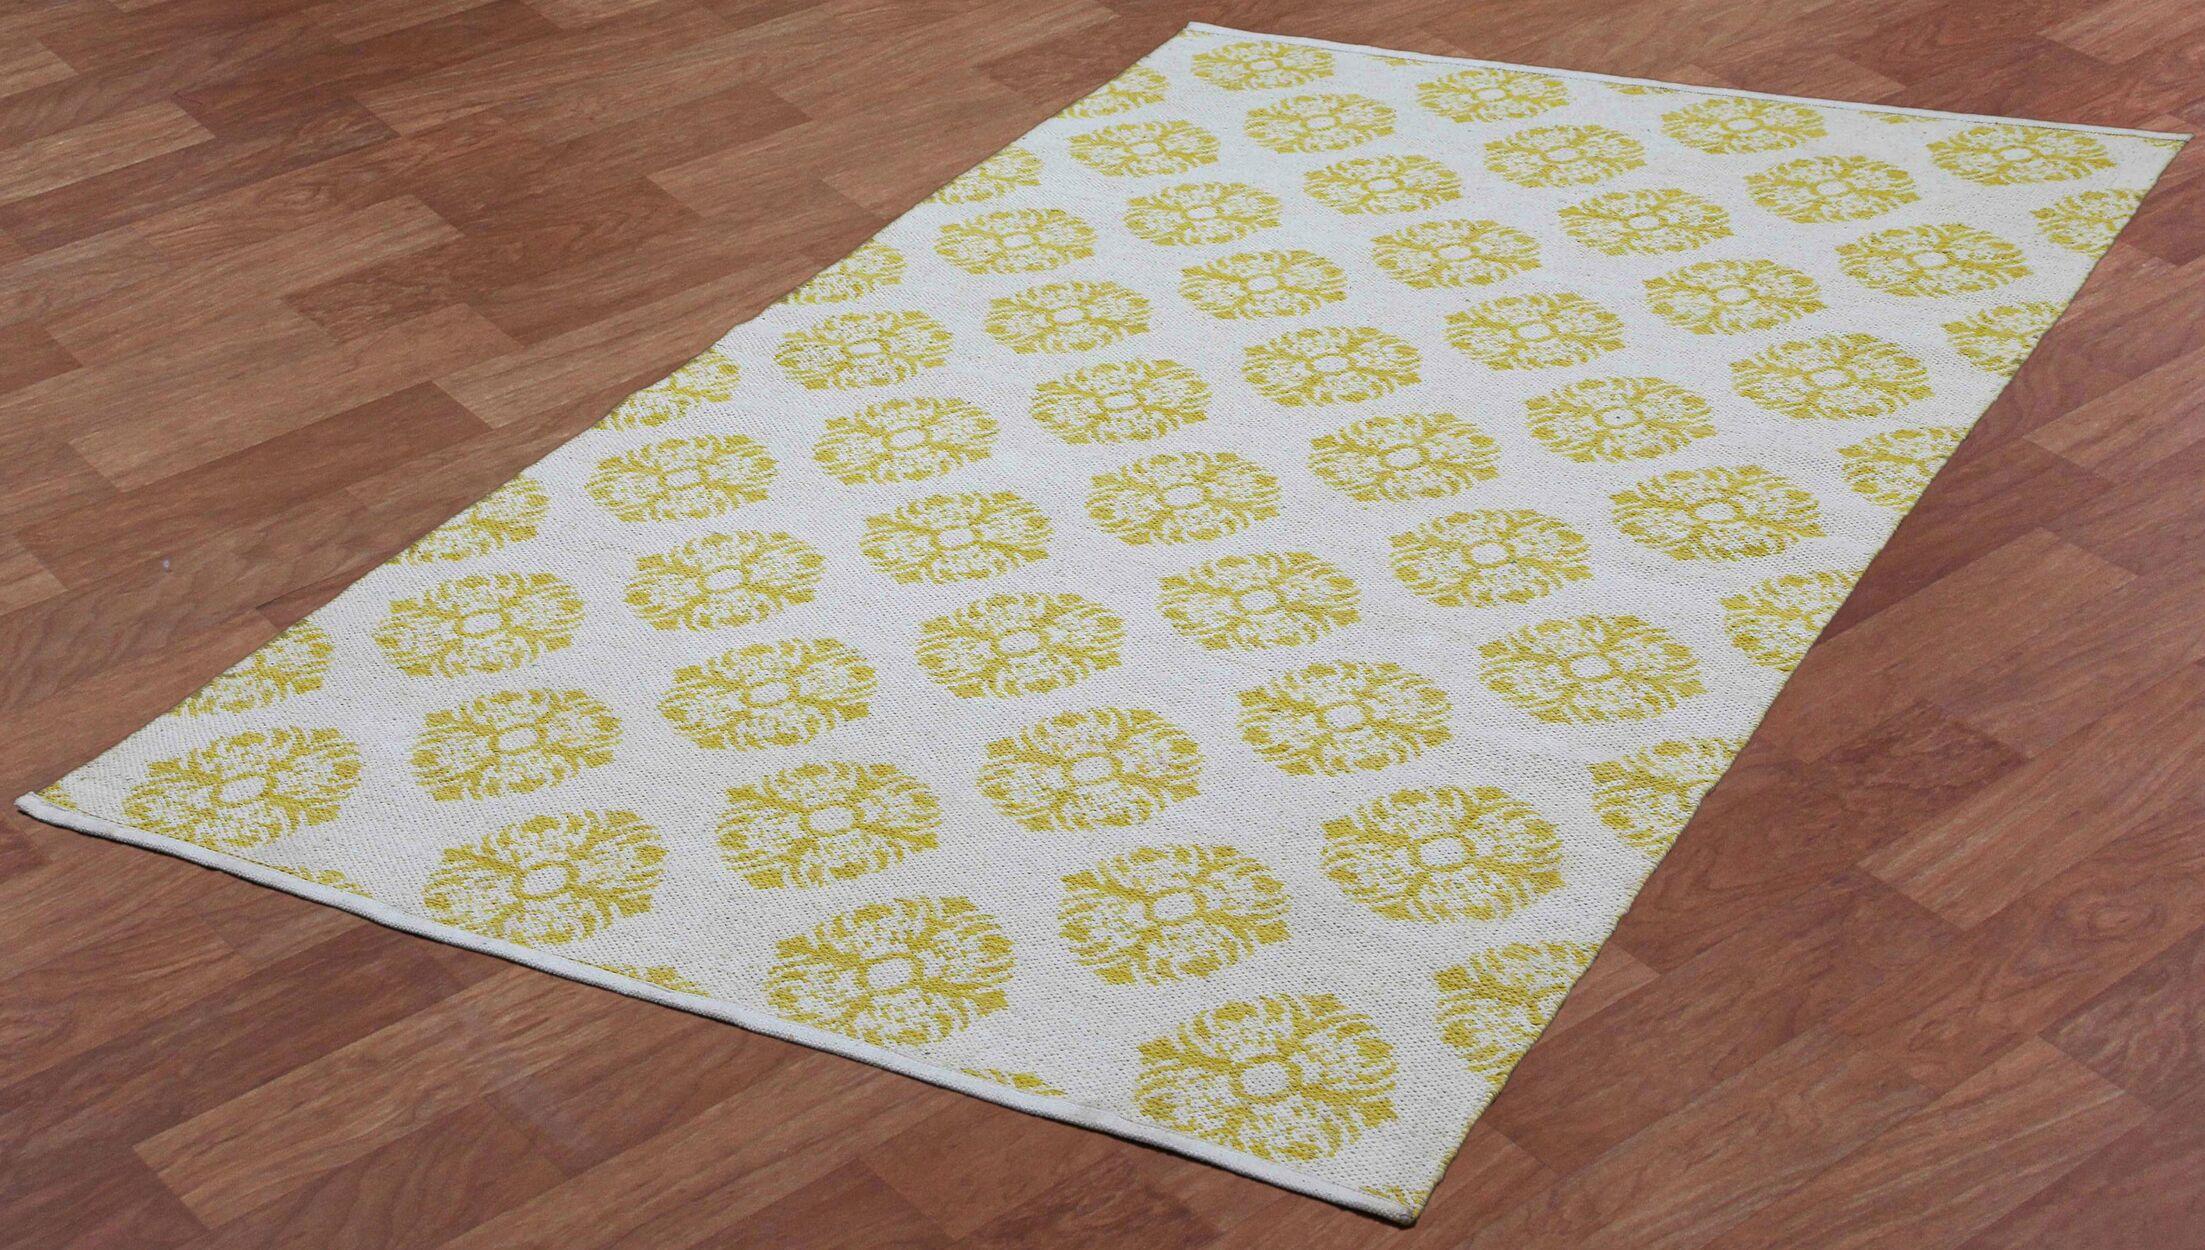 Jacquard Handmade Yellow Area Rug Rug Size: 5' x 8'